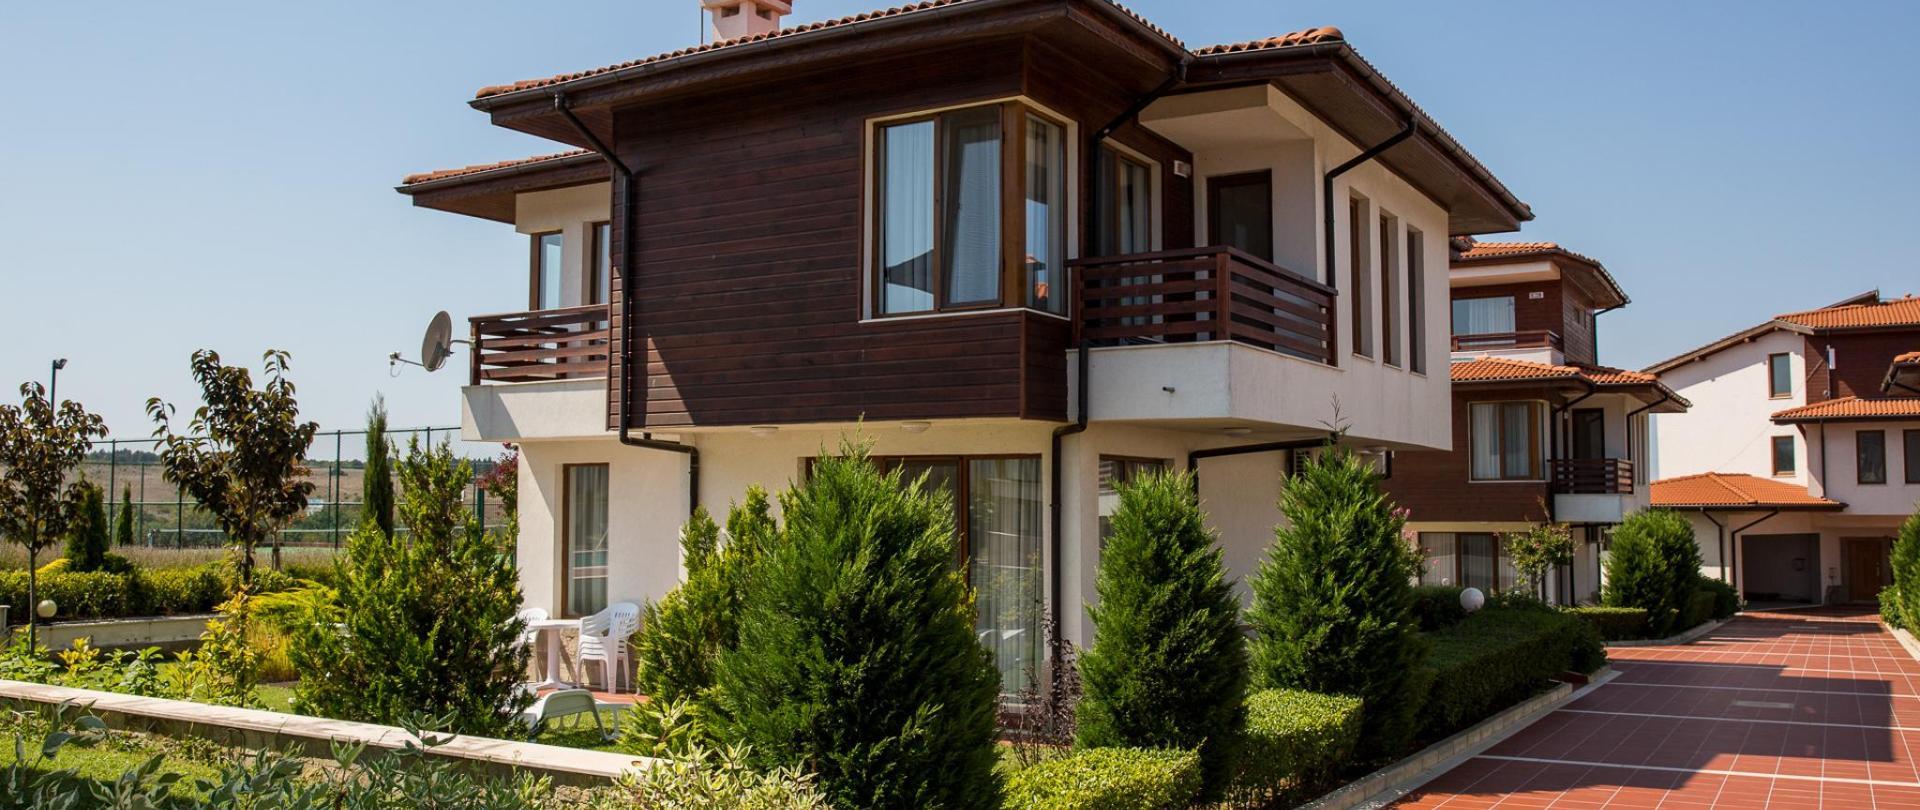 Villas in Complex Trakiyskiy Bryag